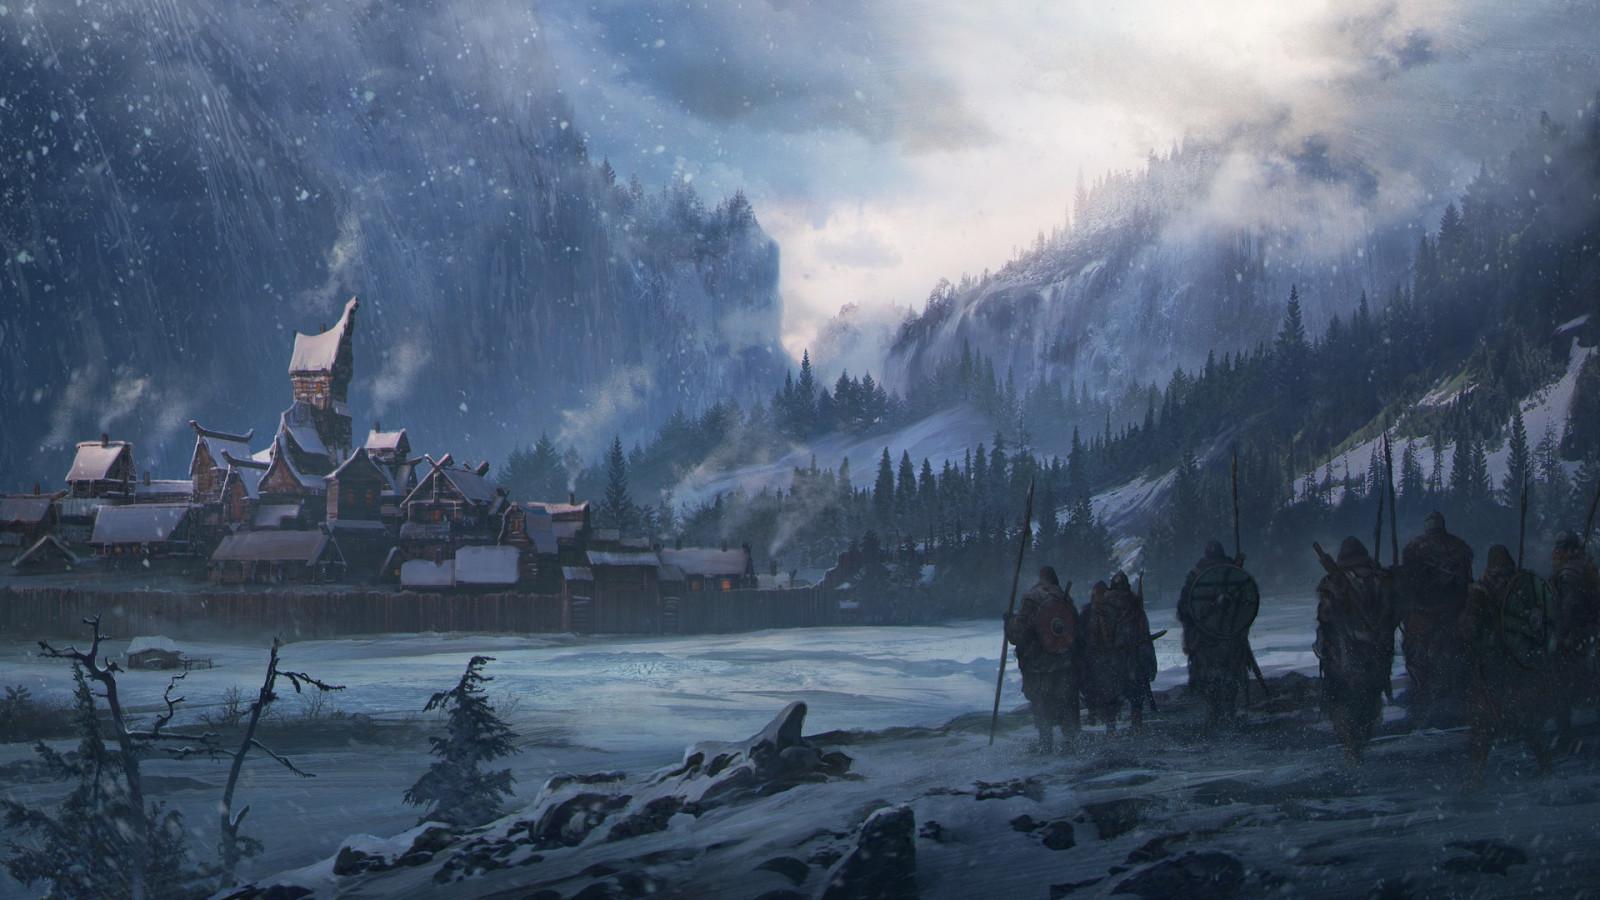 village, artwork, mountains, landscape, nature, fantasy art